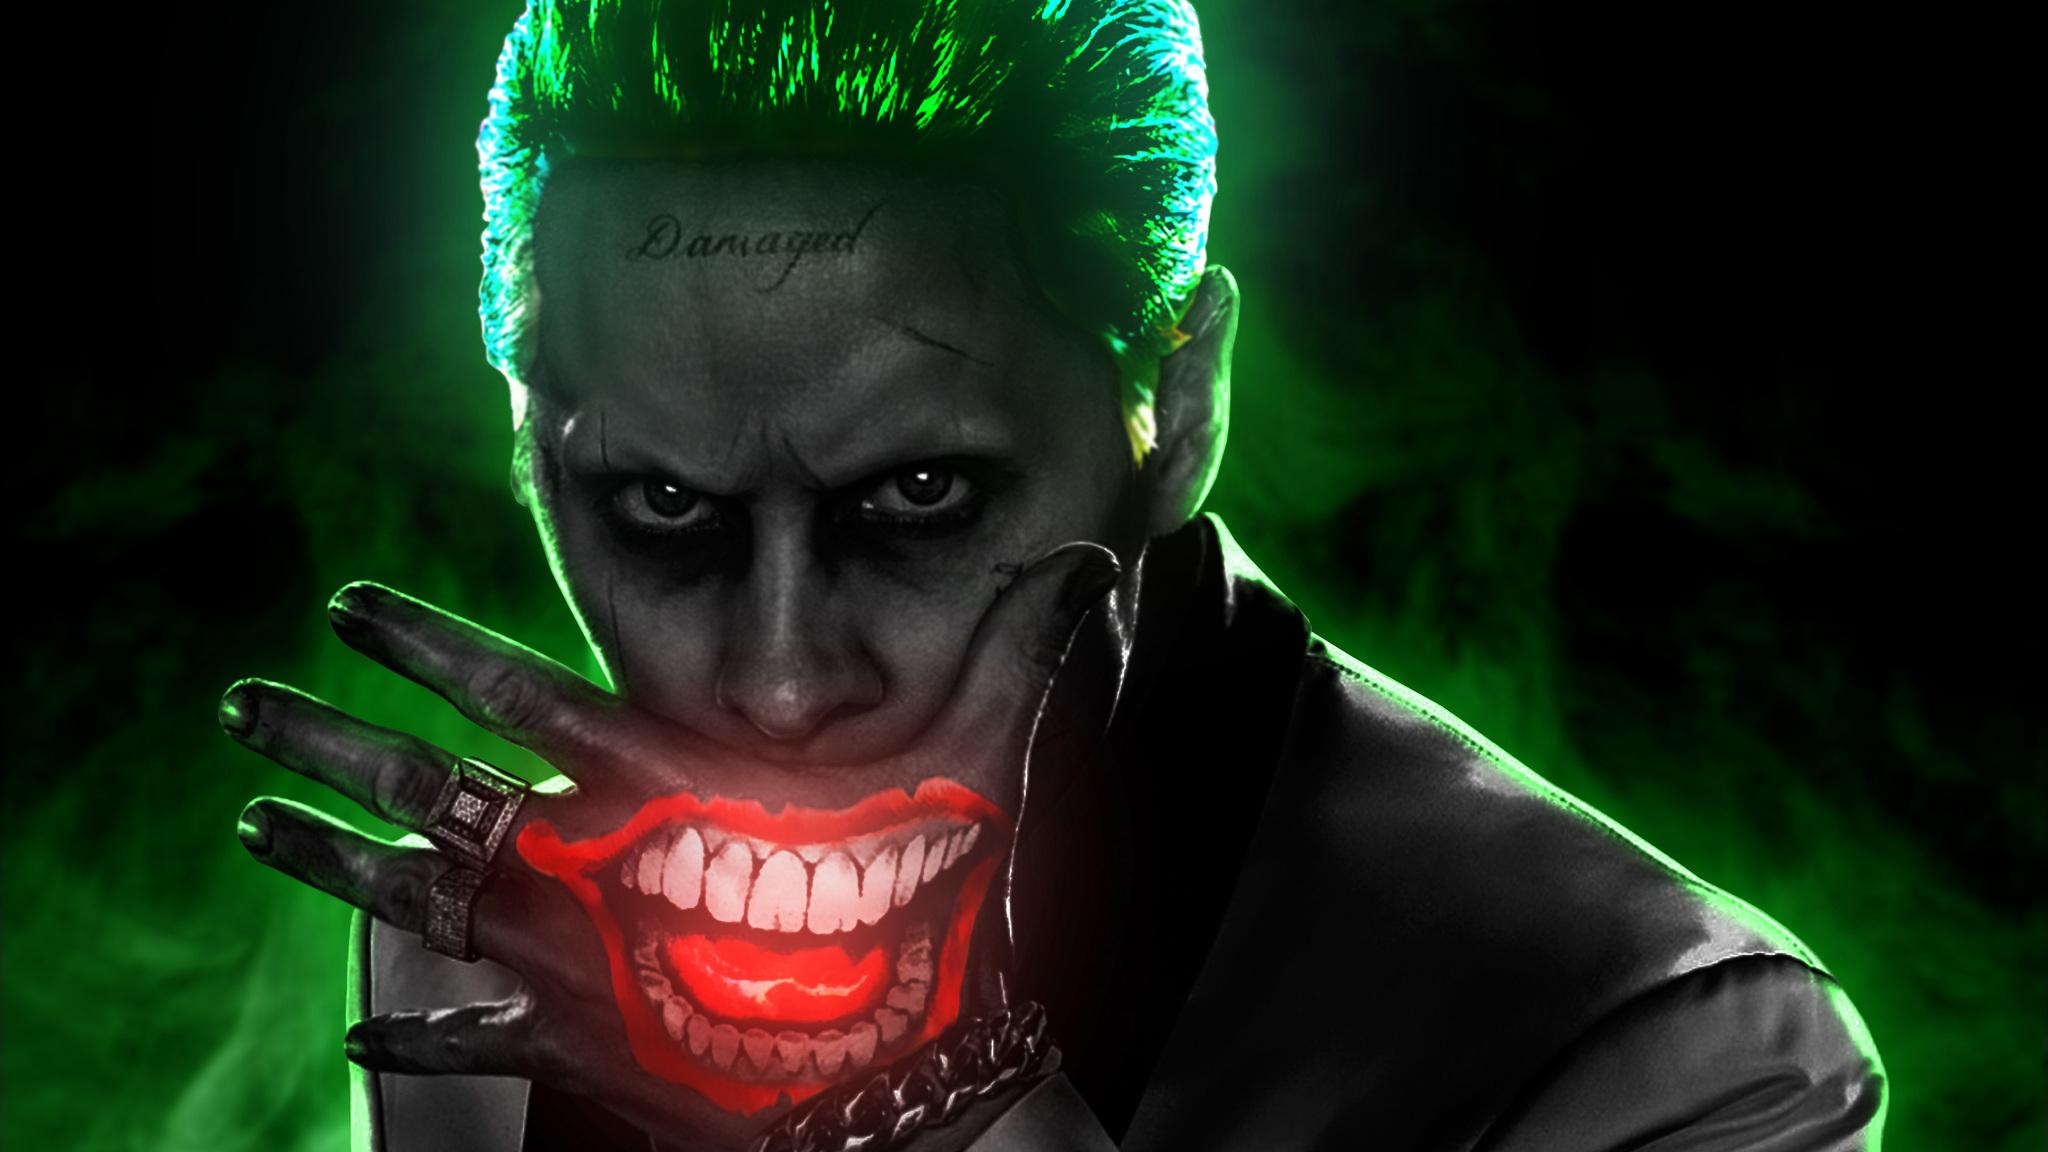 2048x1152 Jared Leto Joker 4k 2048x1152 Resolution HD 4k ...